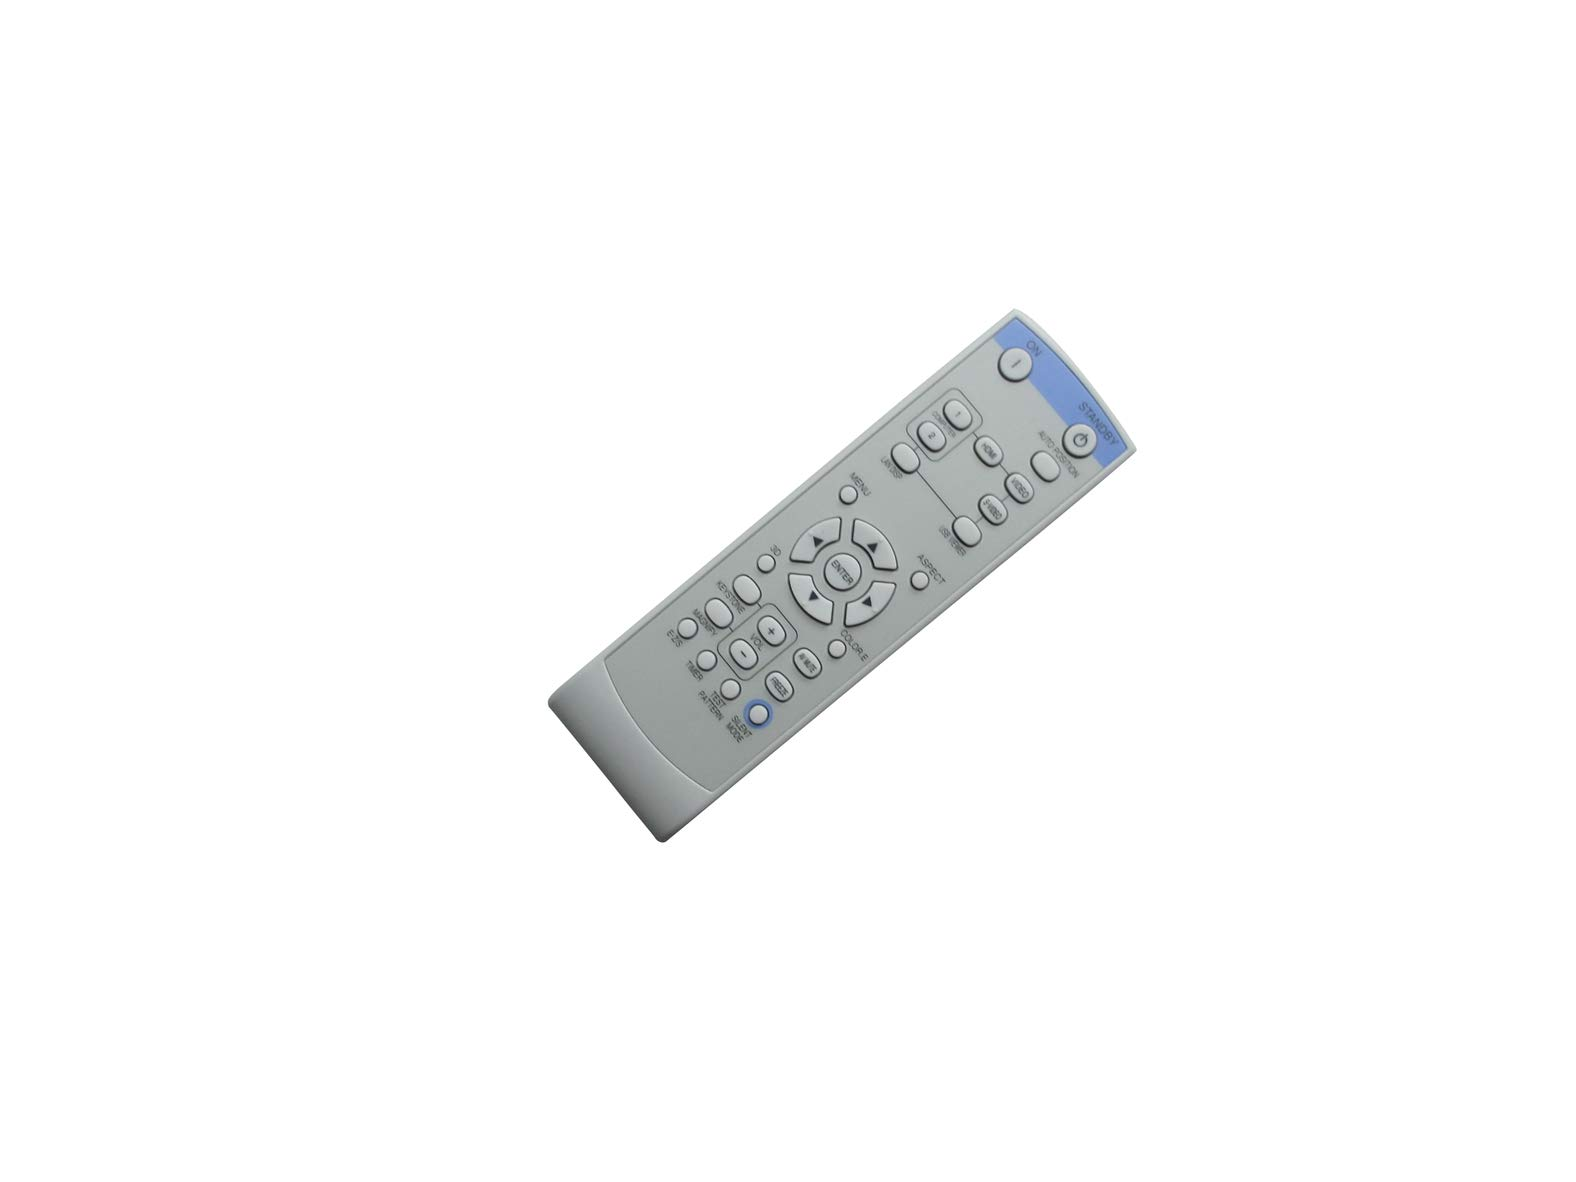 HCDZ Replacement Remote Control for Mitsubishi SD220U XD600U XD600U-G XD600 XGA Conference Room DLP Projector